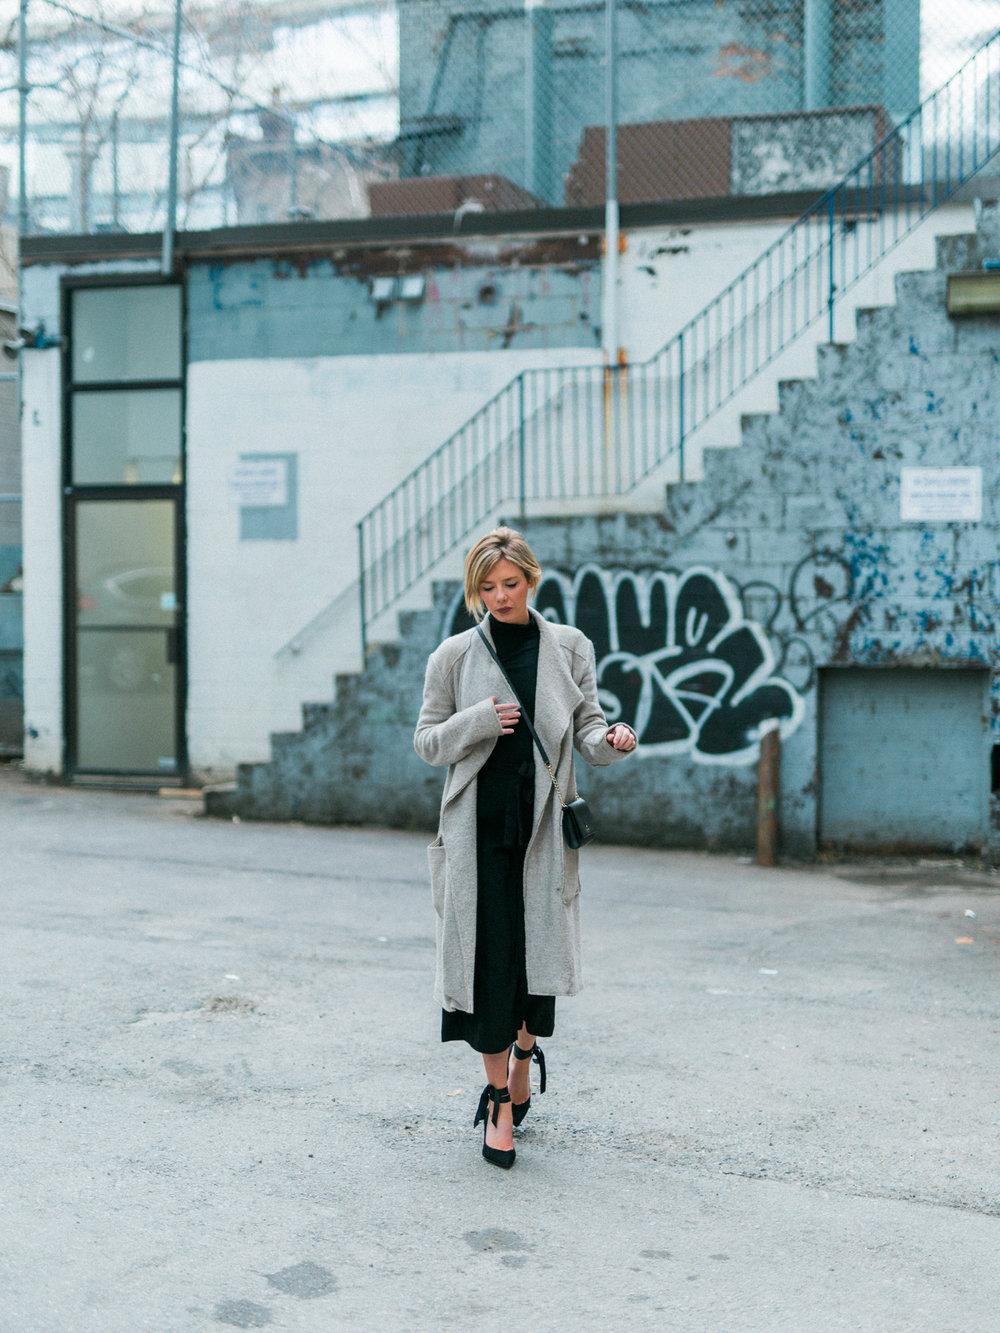 DanielleGirouxPhotography_Toronto_Portrait_StreetPhotography_0C6A1170.jpg